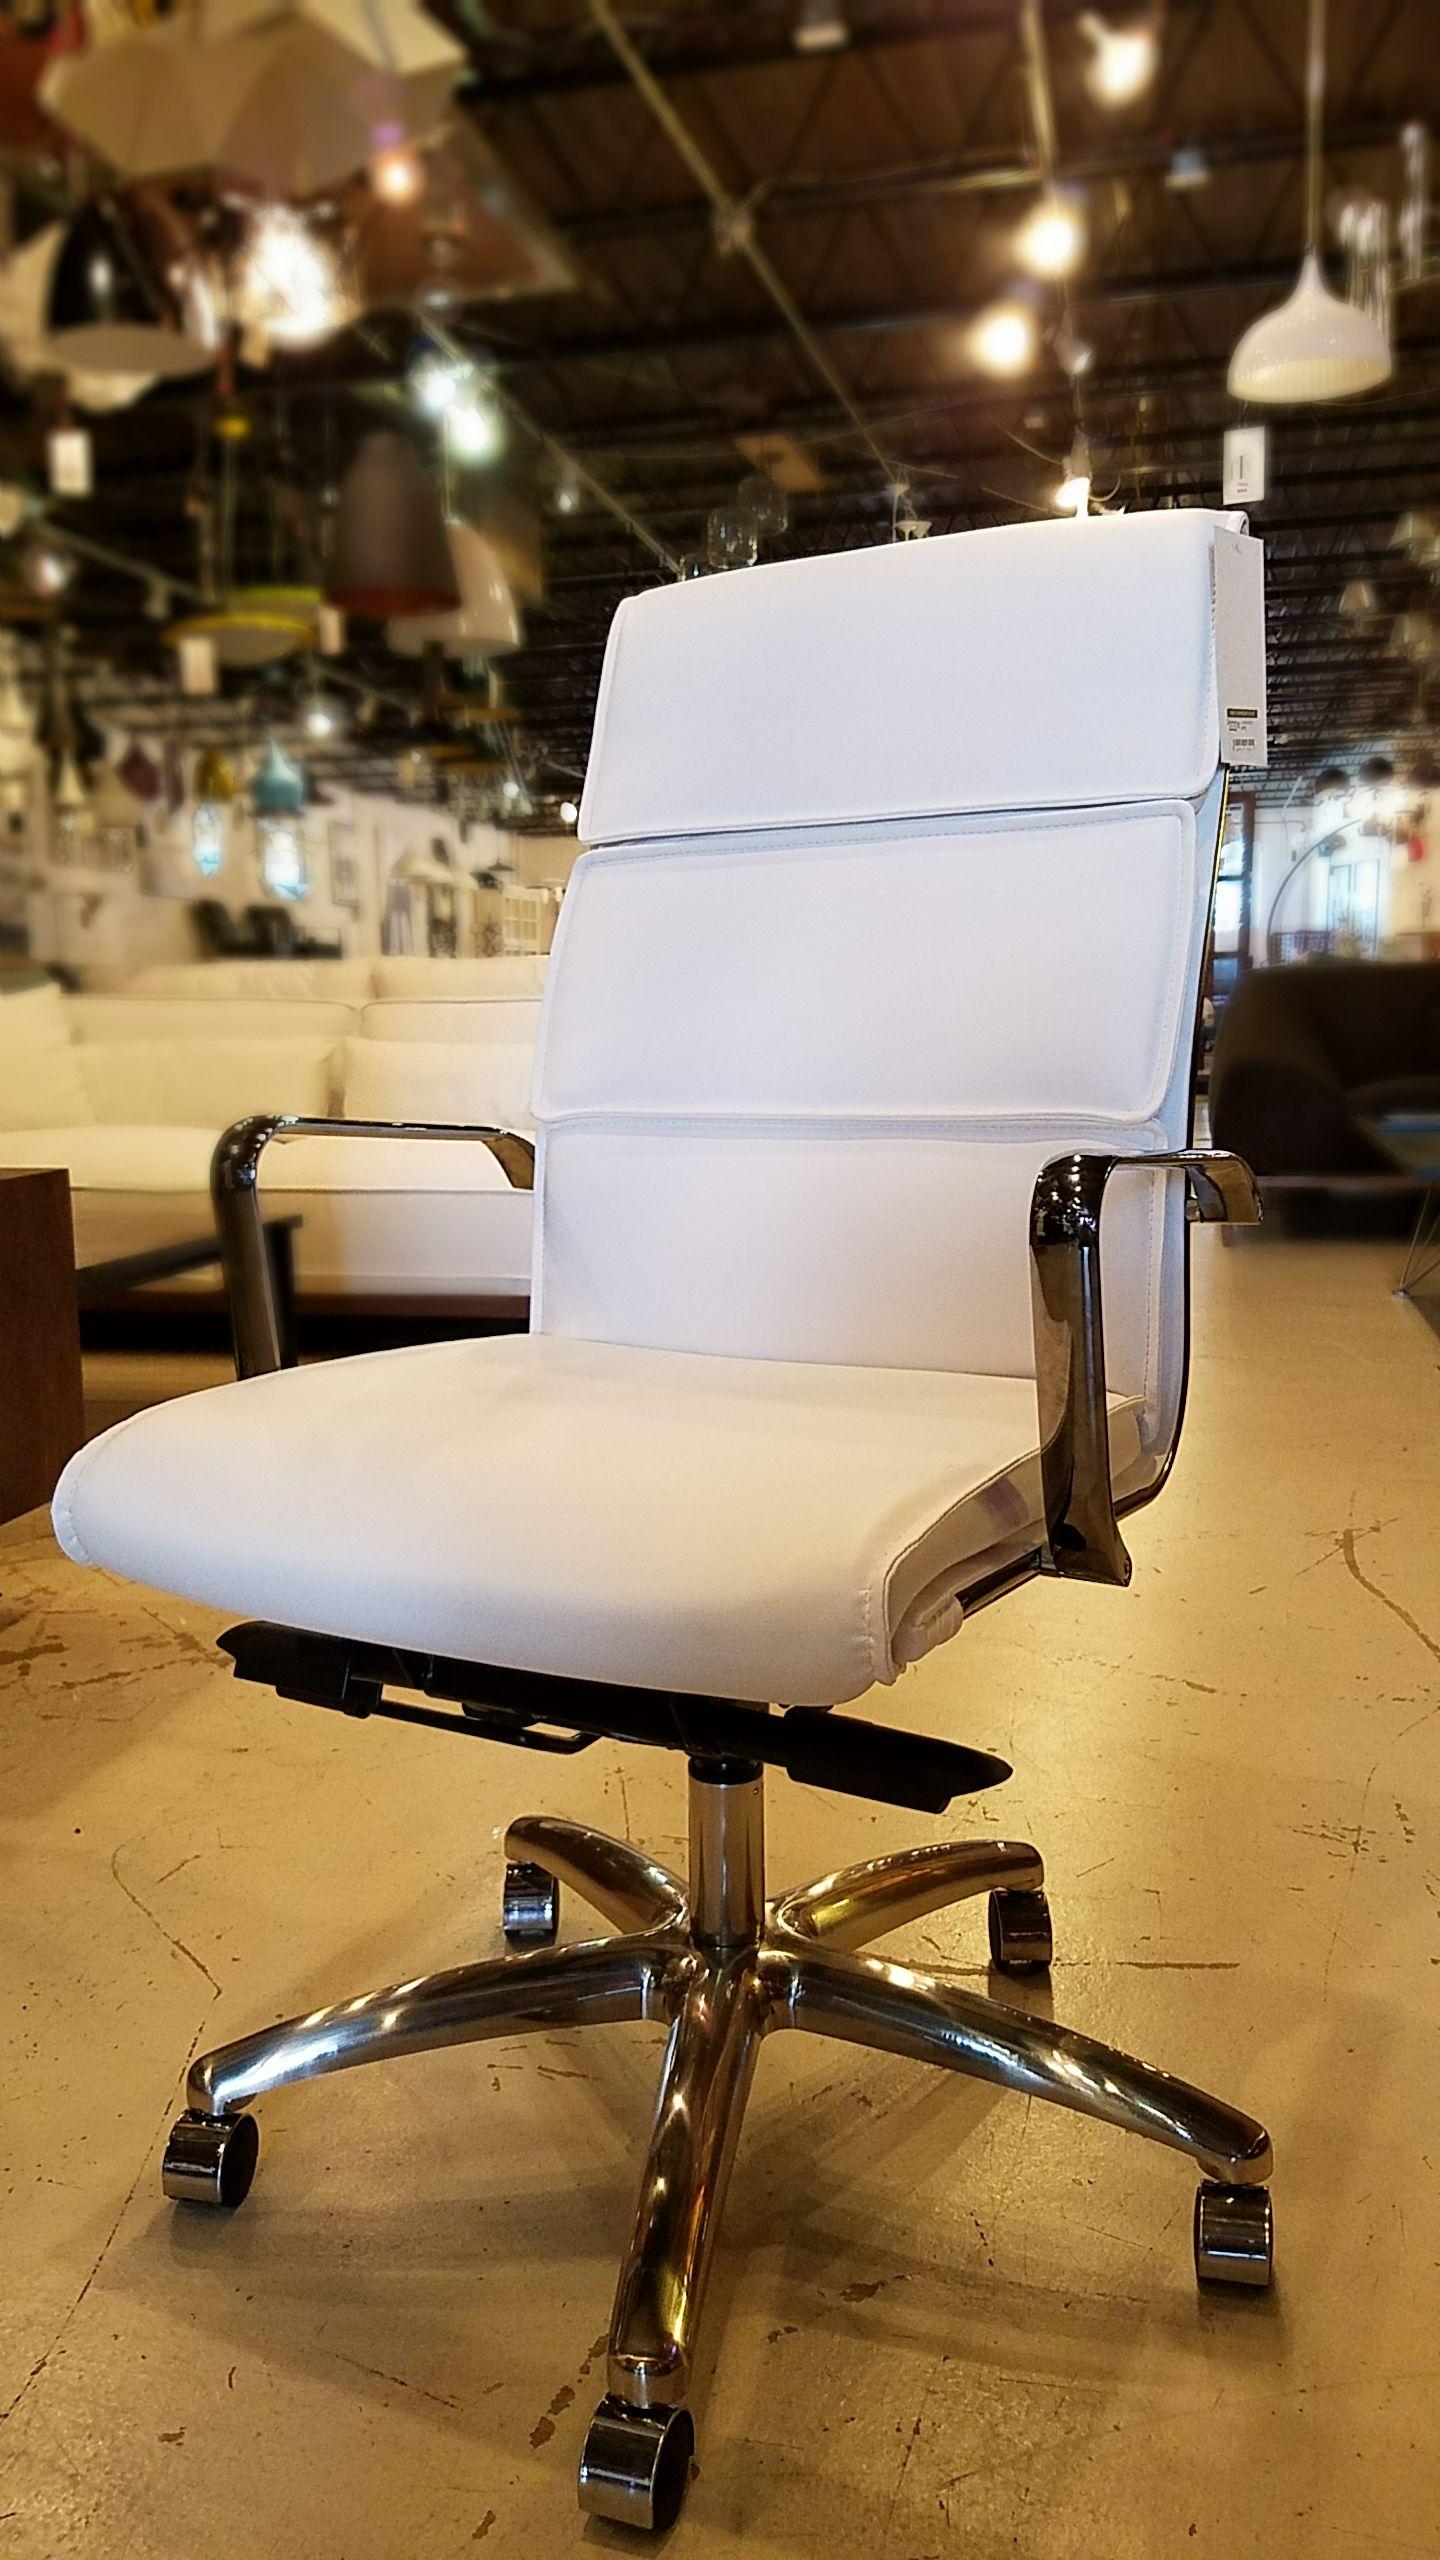 Direct Furniture Outlet Info Directfurnitureoutlet Us 1005 Howell Mill Rd Atlanta Ga 30318 1 404 477 0038